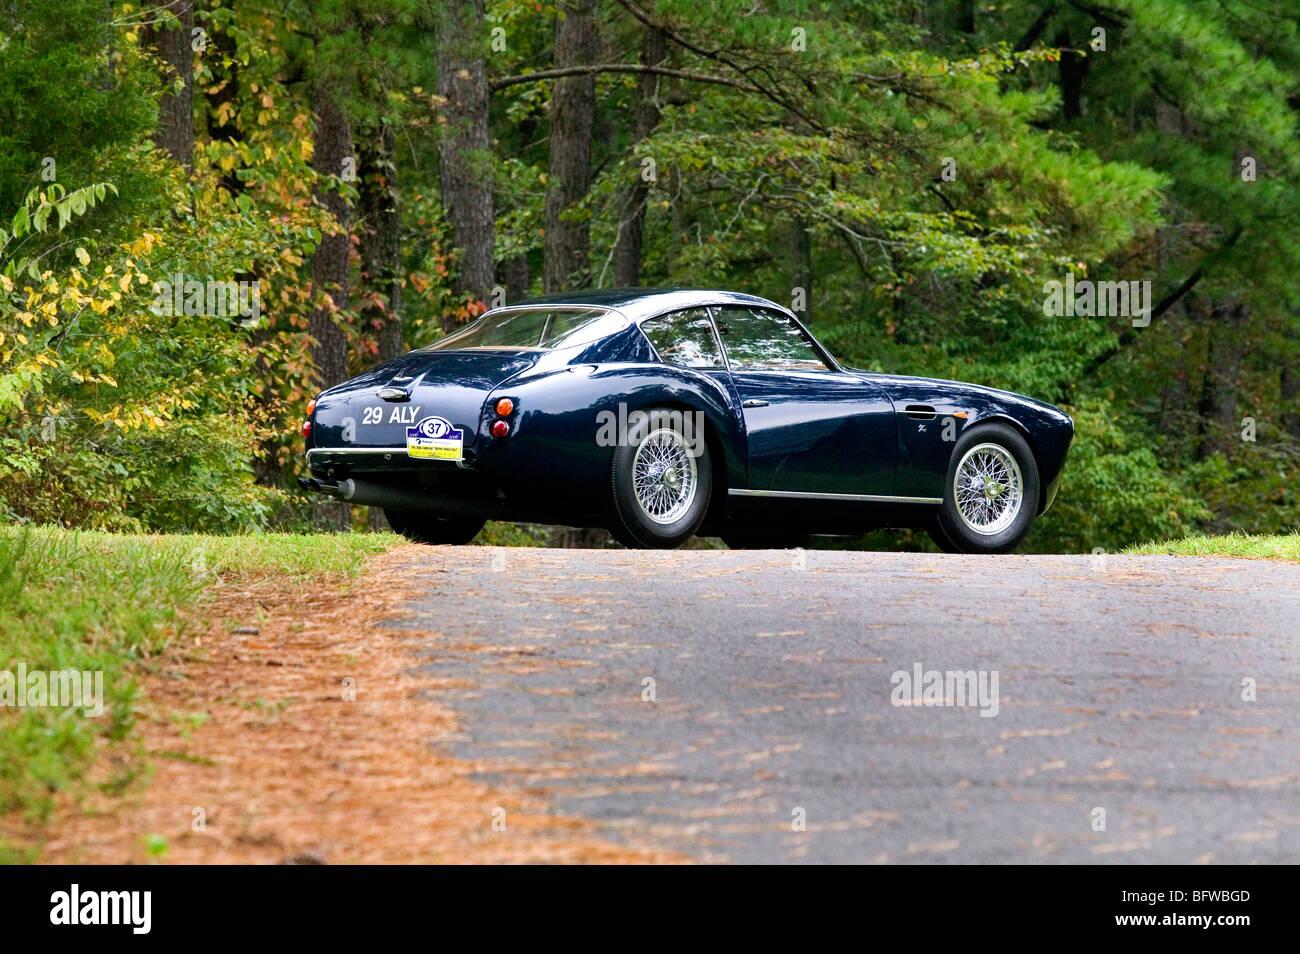 Aston Martin Db 4 Zagato 1960 Stockfotografie Alamy